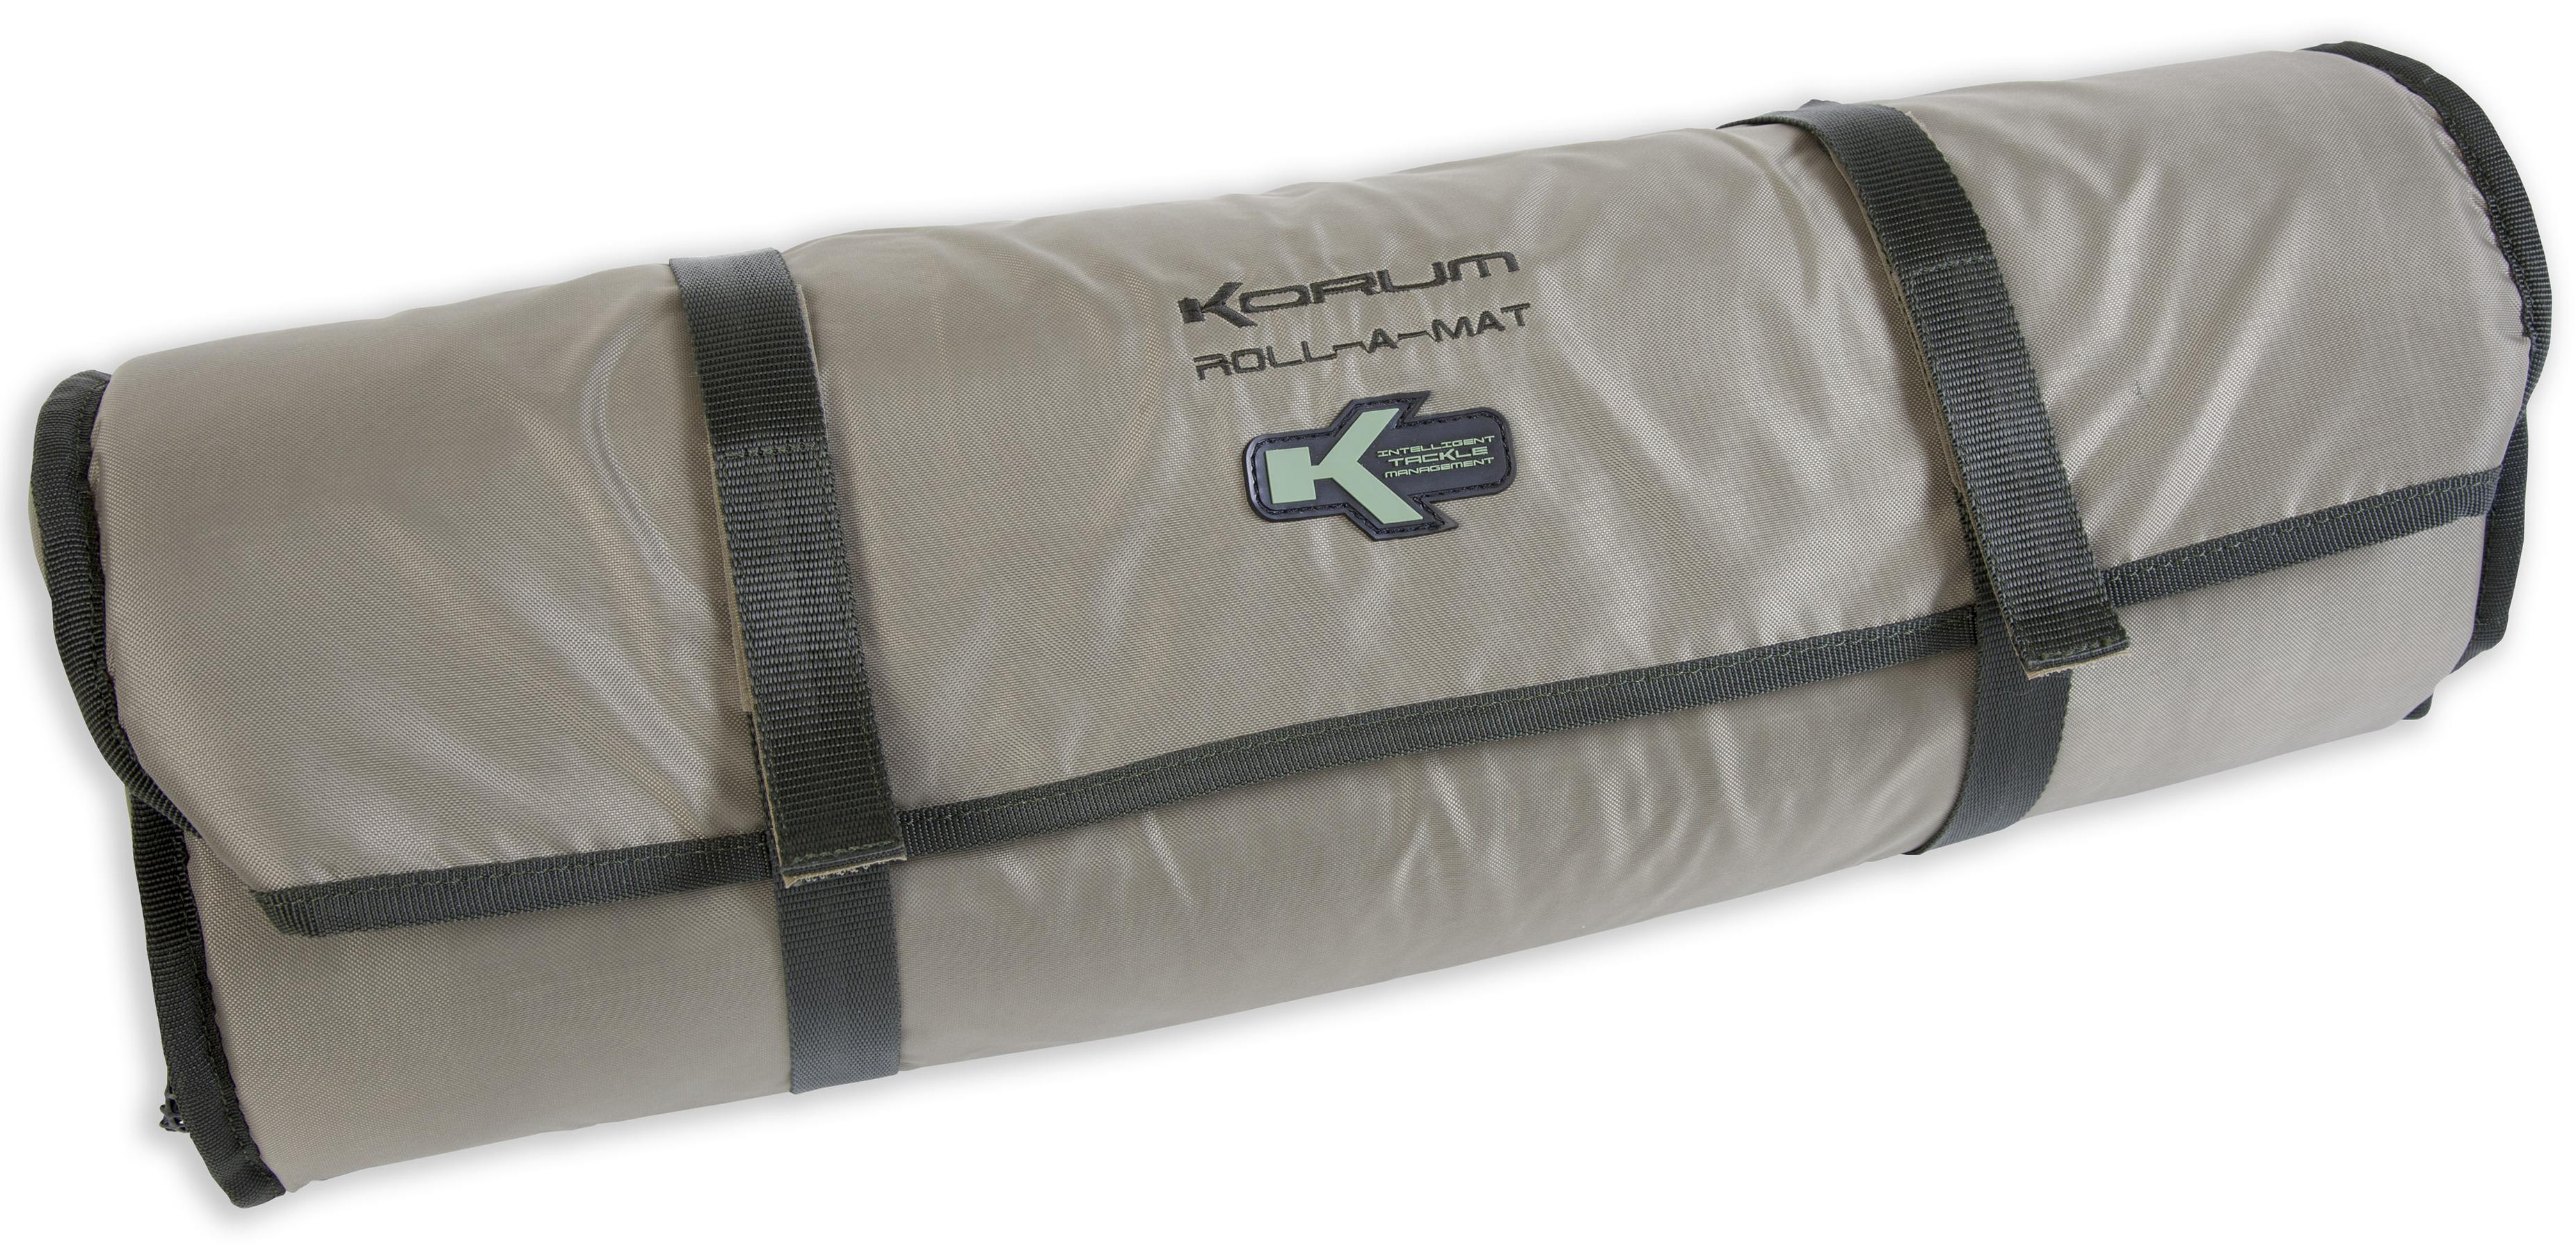 Korum Deluxe Roll A Mat Glasgow Angling Centre